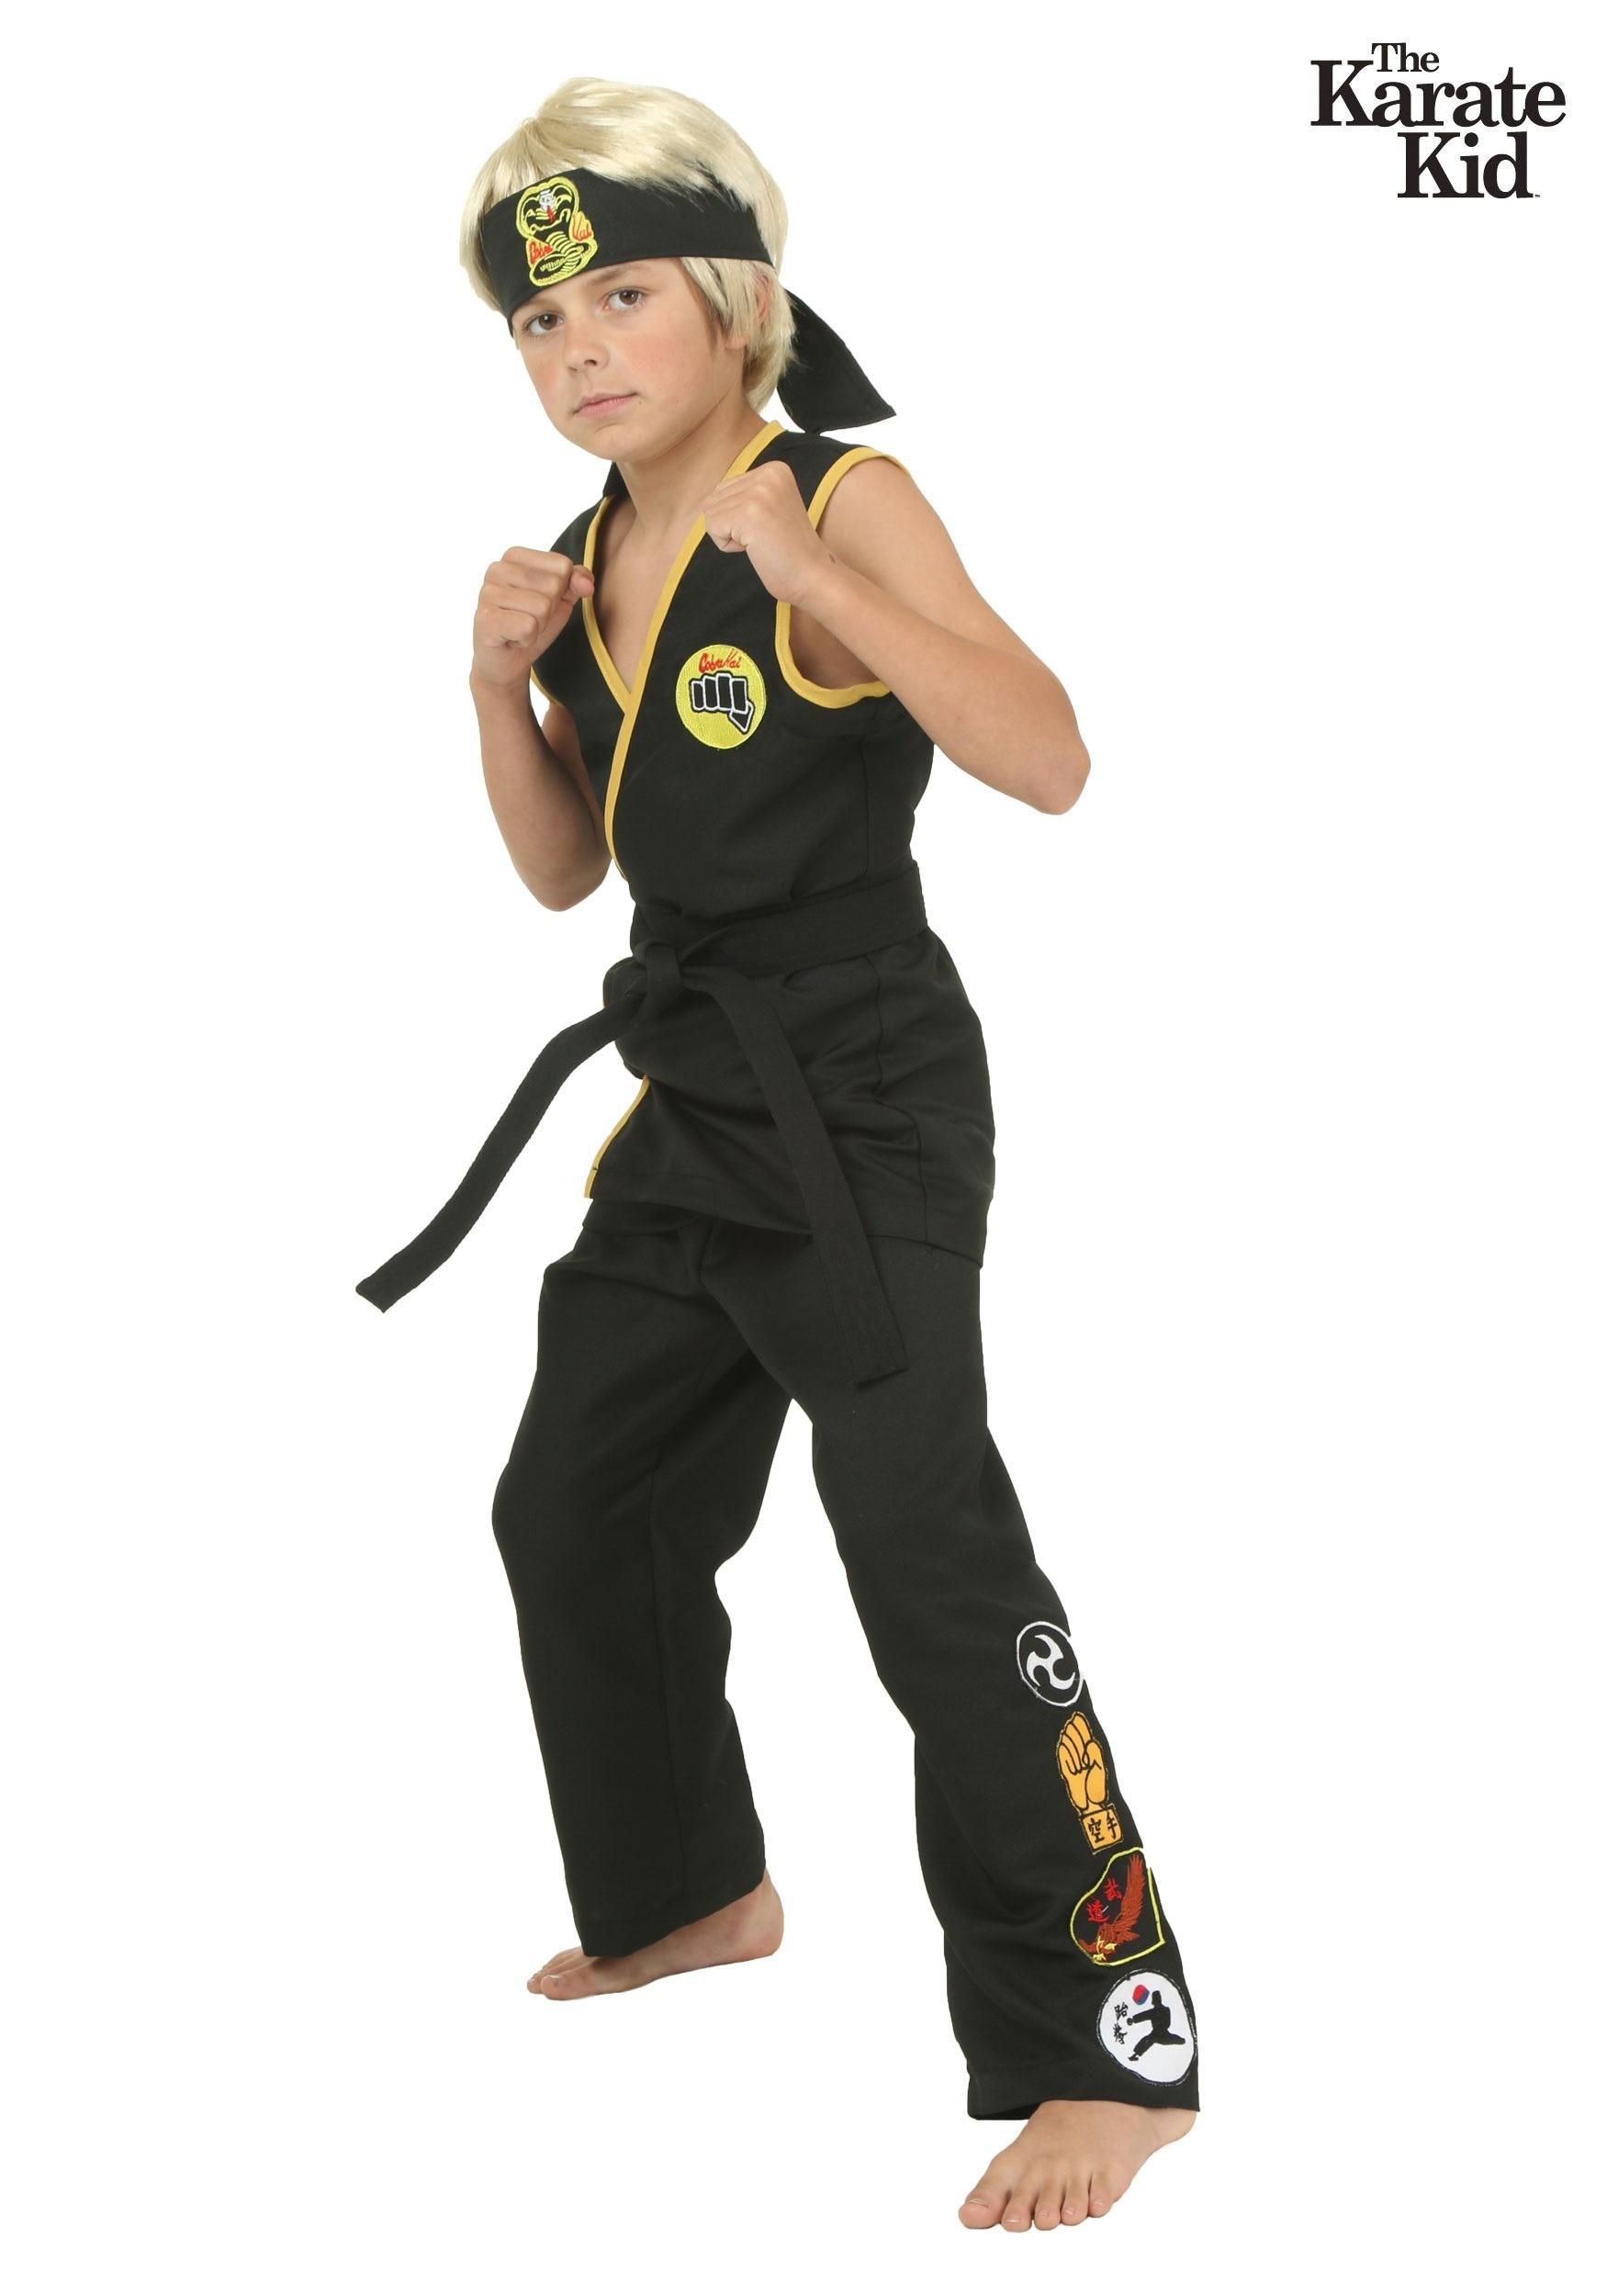 How To Make A Karate Kid Costume